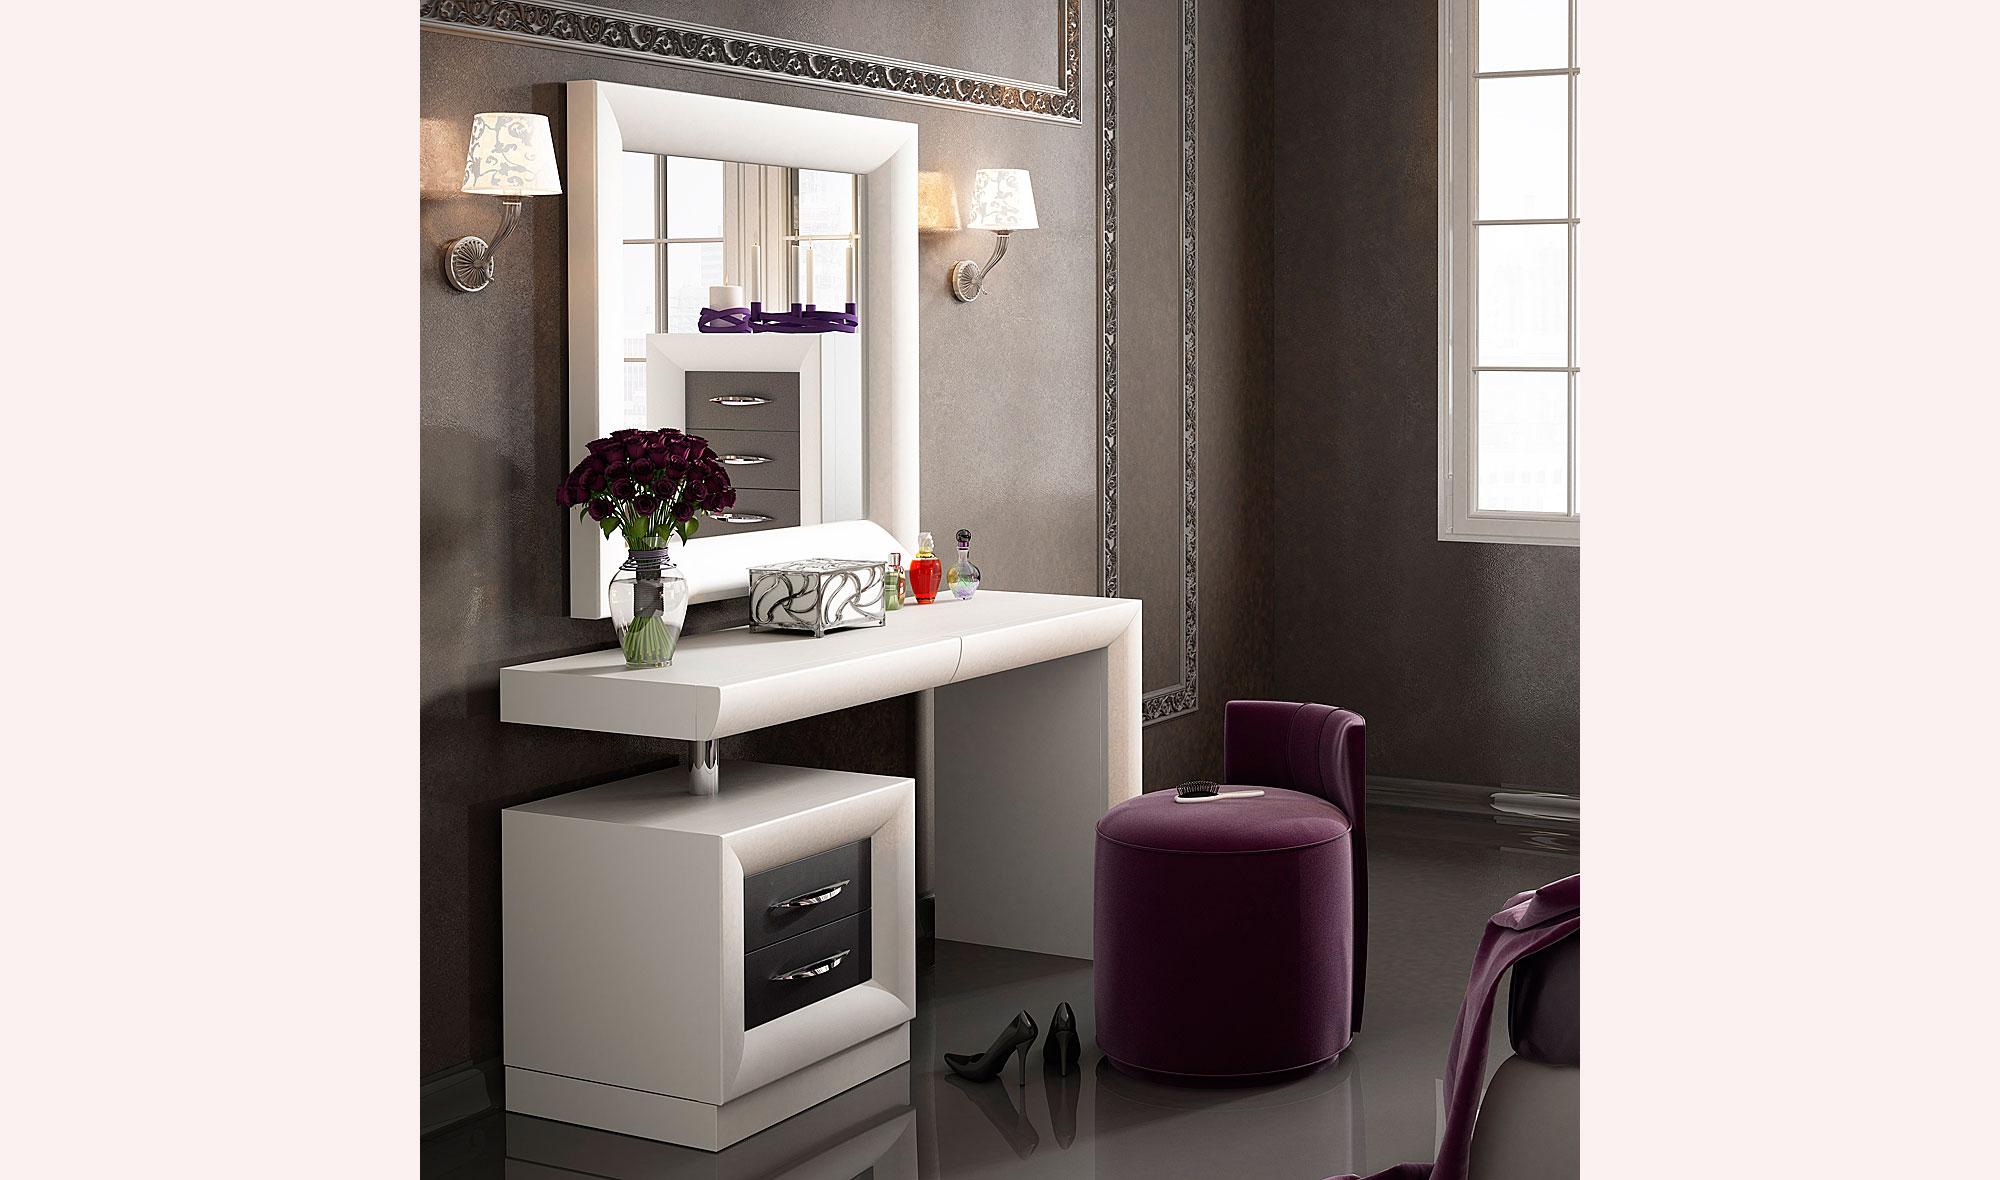 Dormitorio tocador tocador tocador moderno minimalista apartamento ...